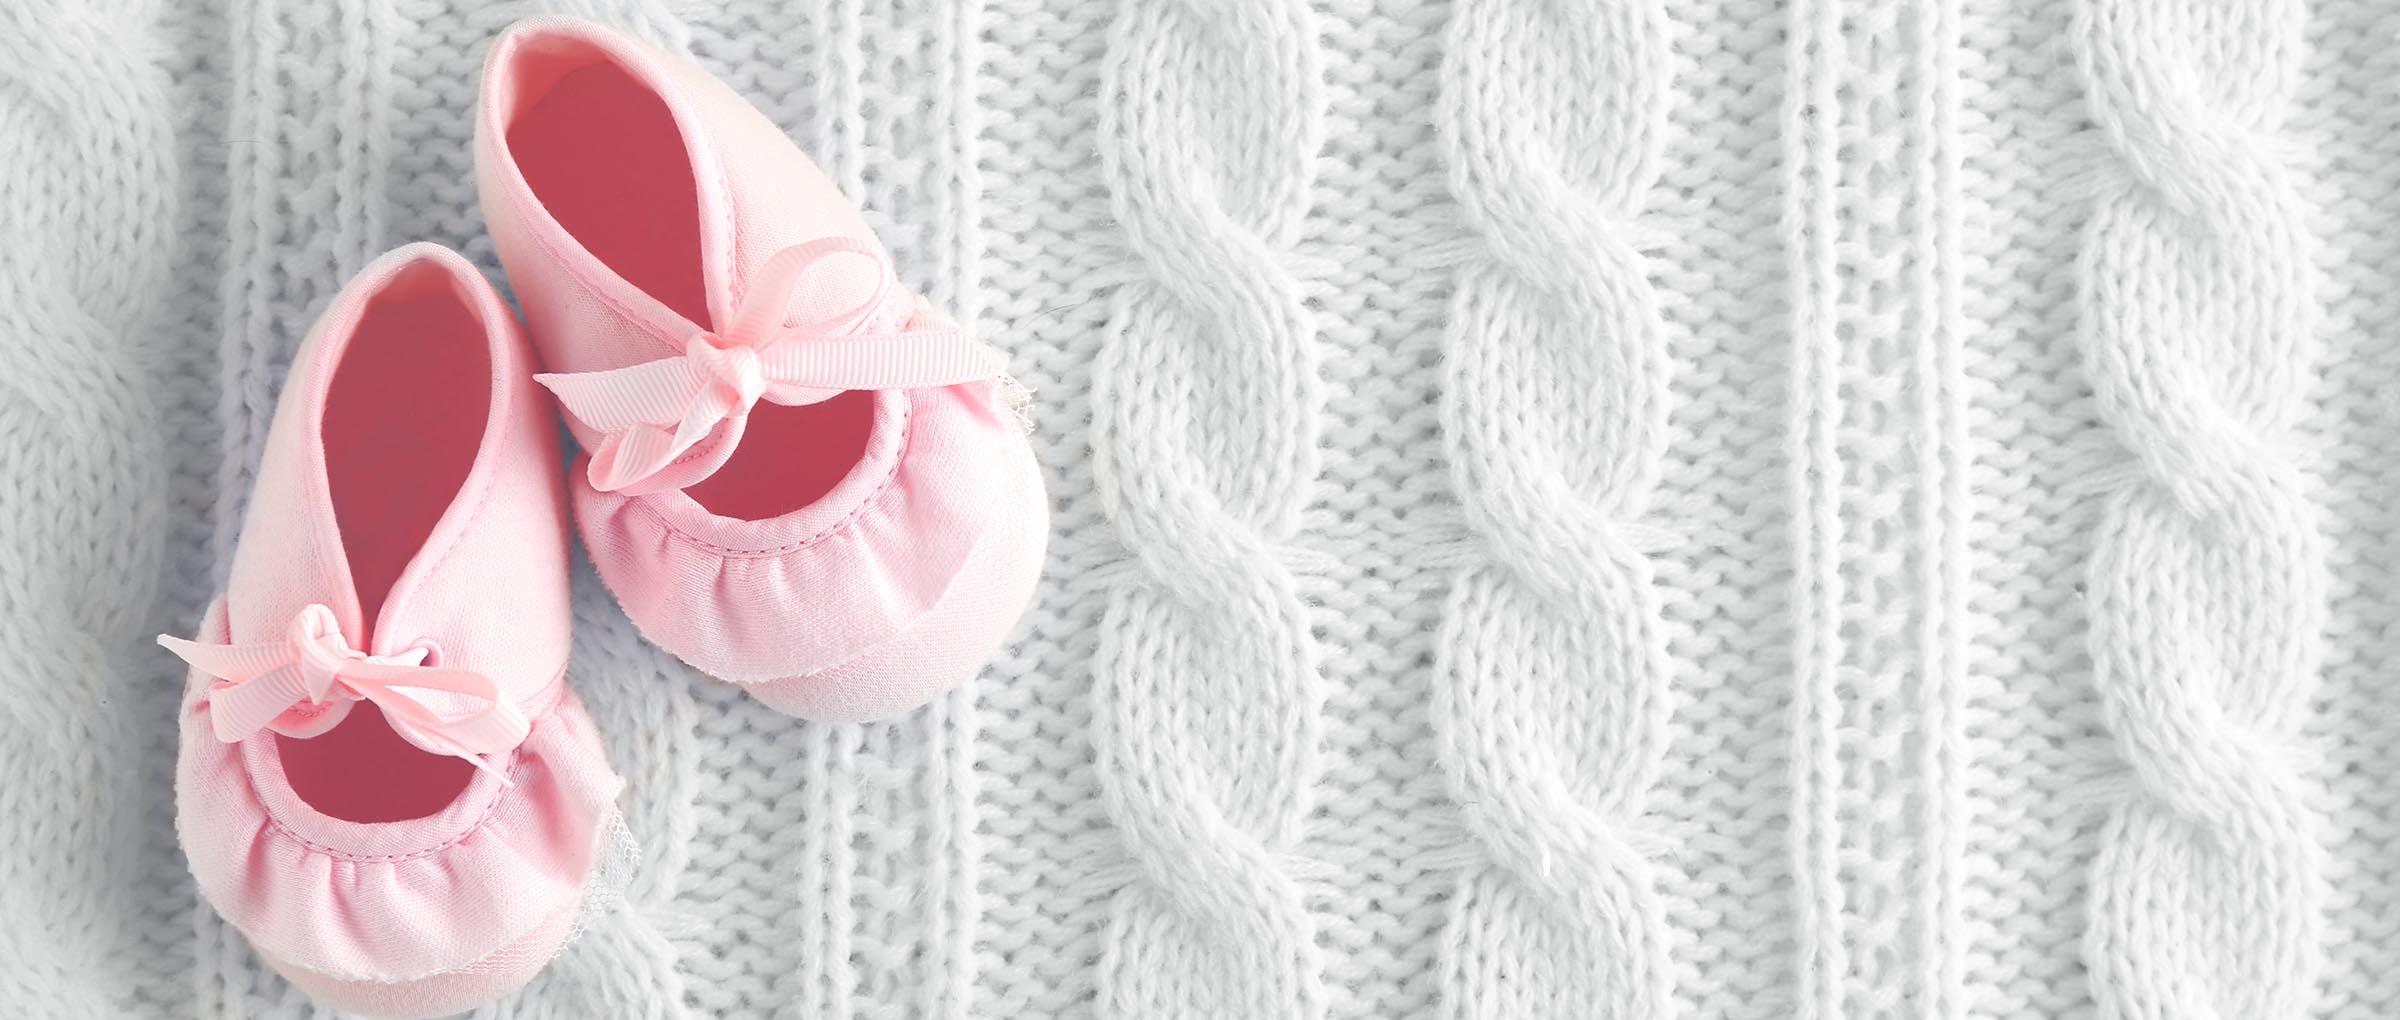 Técnicas de reproducción asistida en MATER Reproducción Asistida